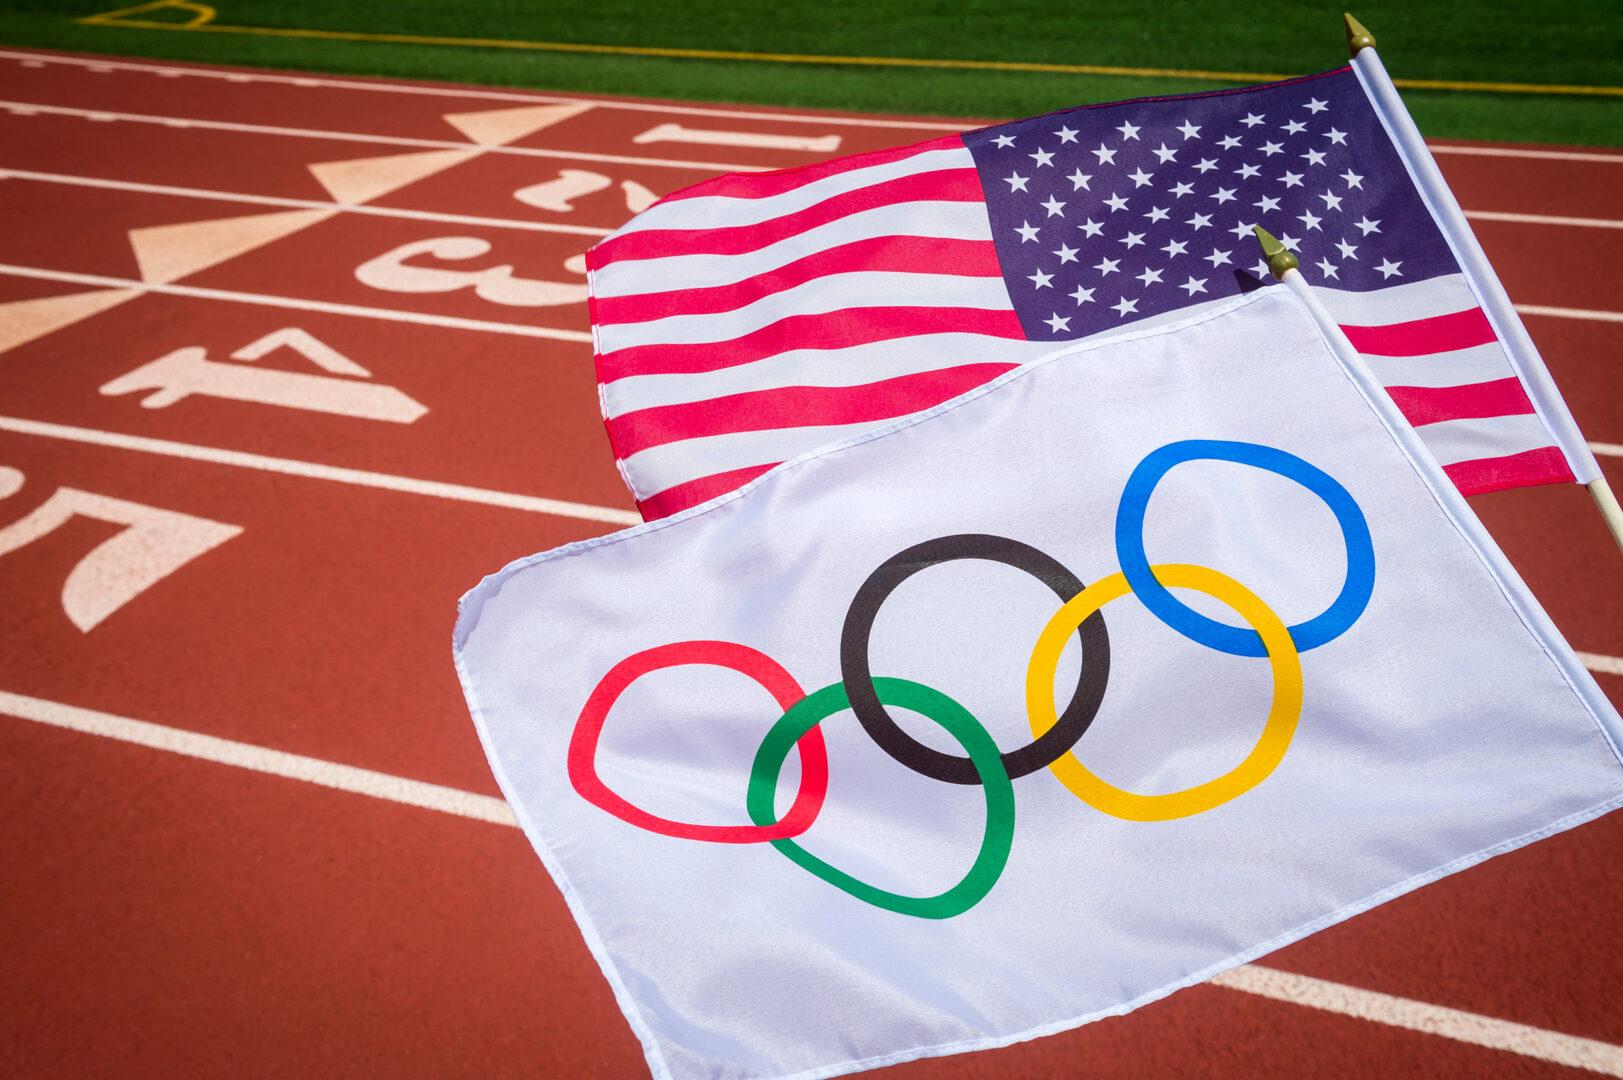 Joe Rogan Rips Olympics Over 'Horsesh*t' Sha'Carri Richardson Ban